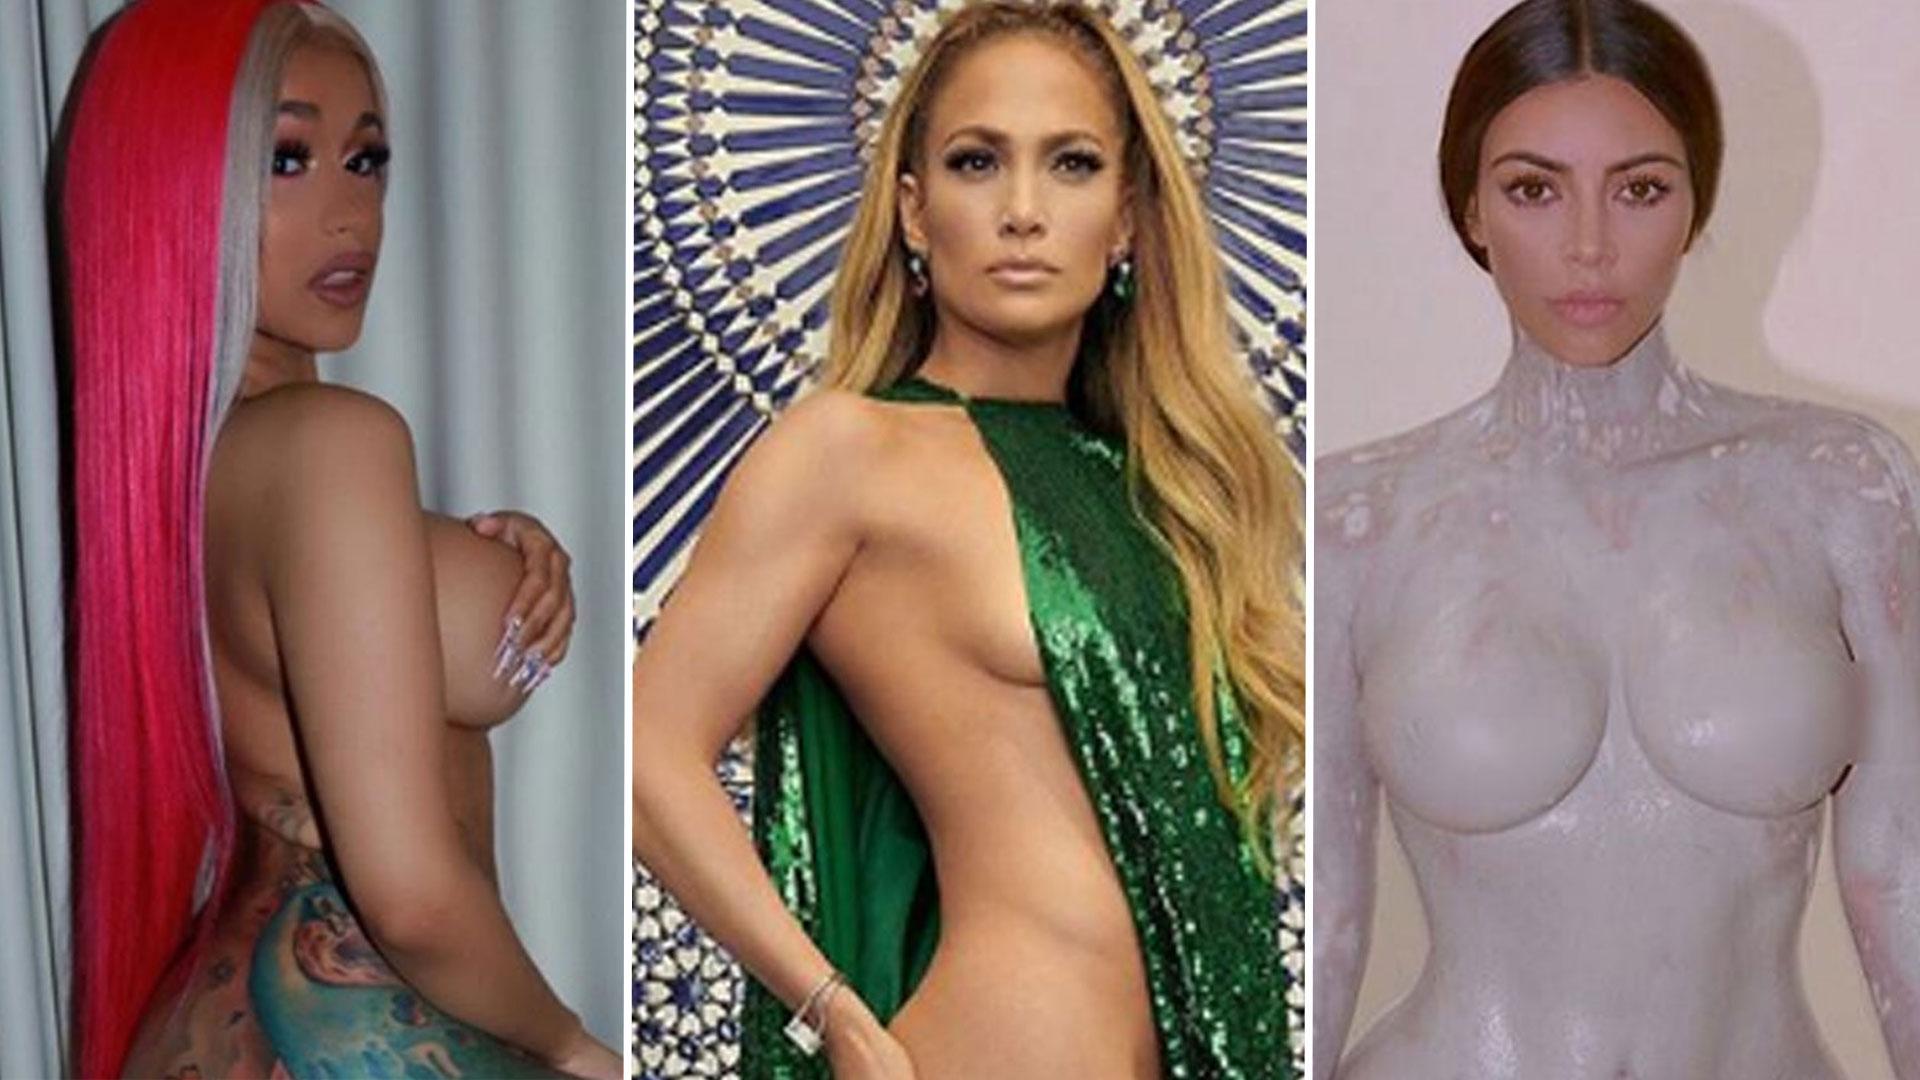 Actrices Españolas En Pelotas famosas que posaron desnudas en 2018 (fotos) | telemundo